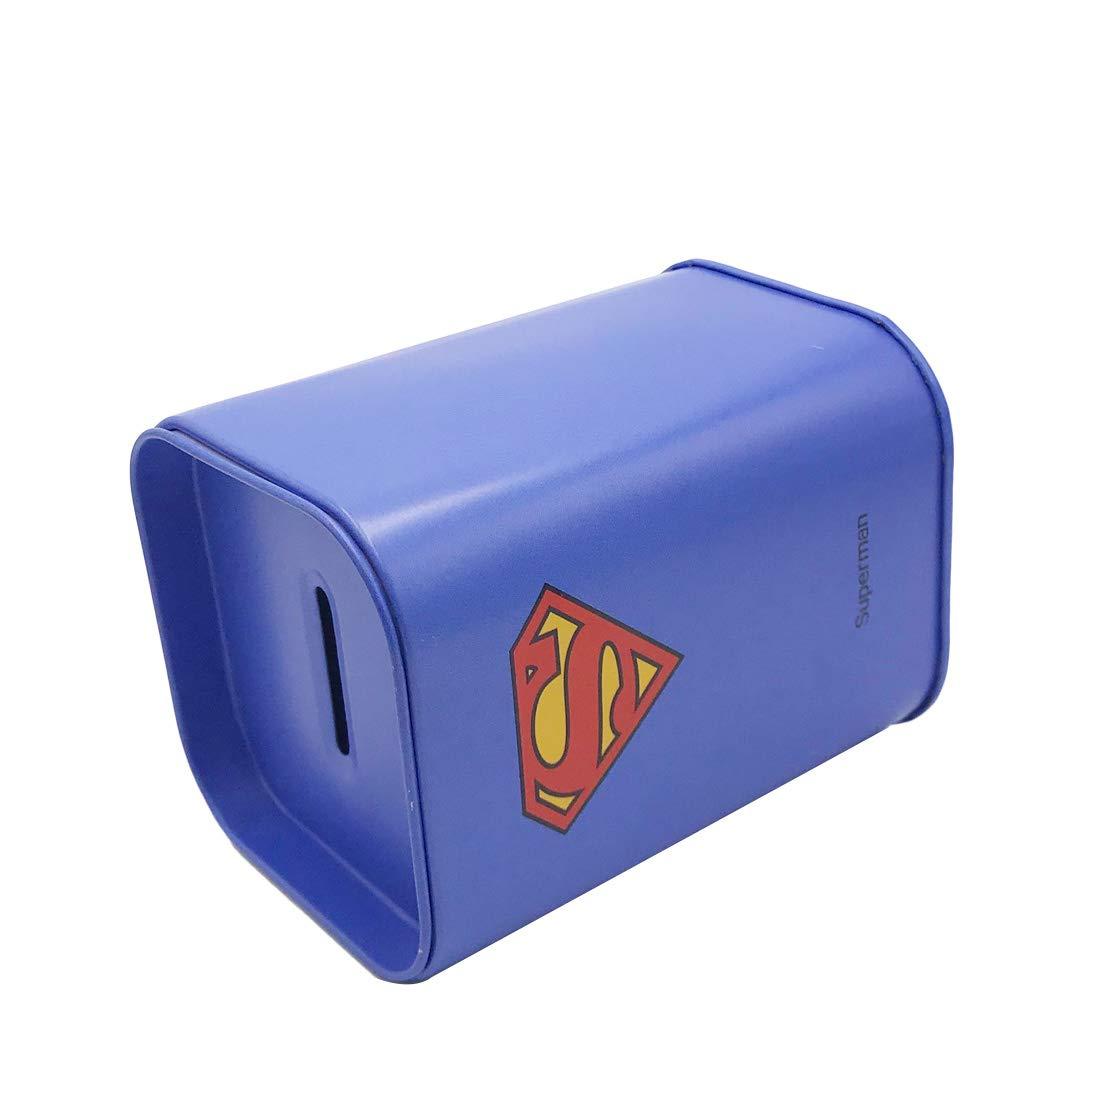 Captain America Ayiguri Superhero Creative Piggy Bank Metal Money Box Coin Bank Tin Can Piggy Bank Rectangular Cute Cartoon Childrens Gift Home Decoration